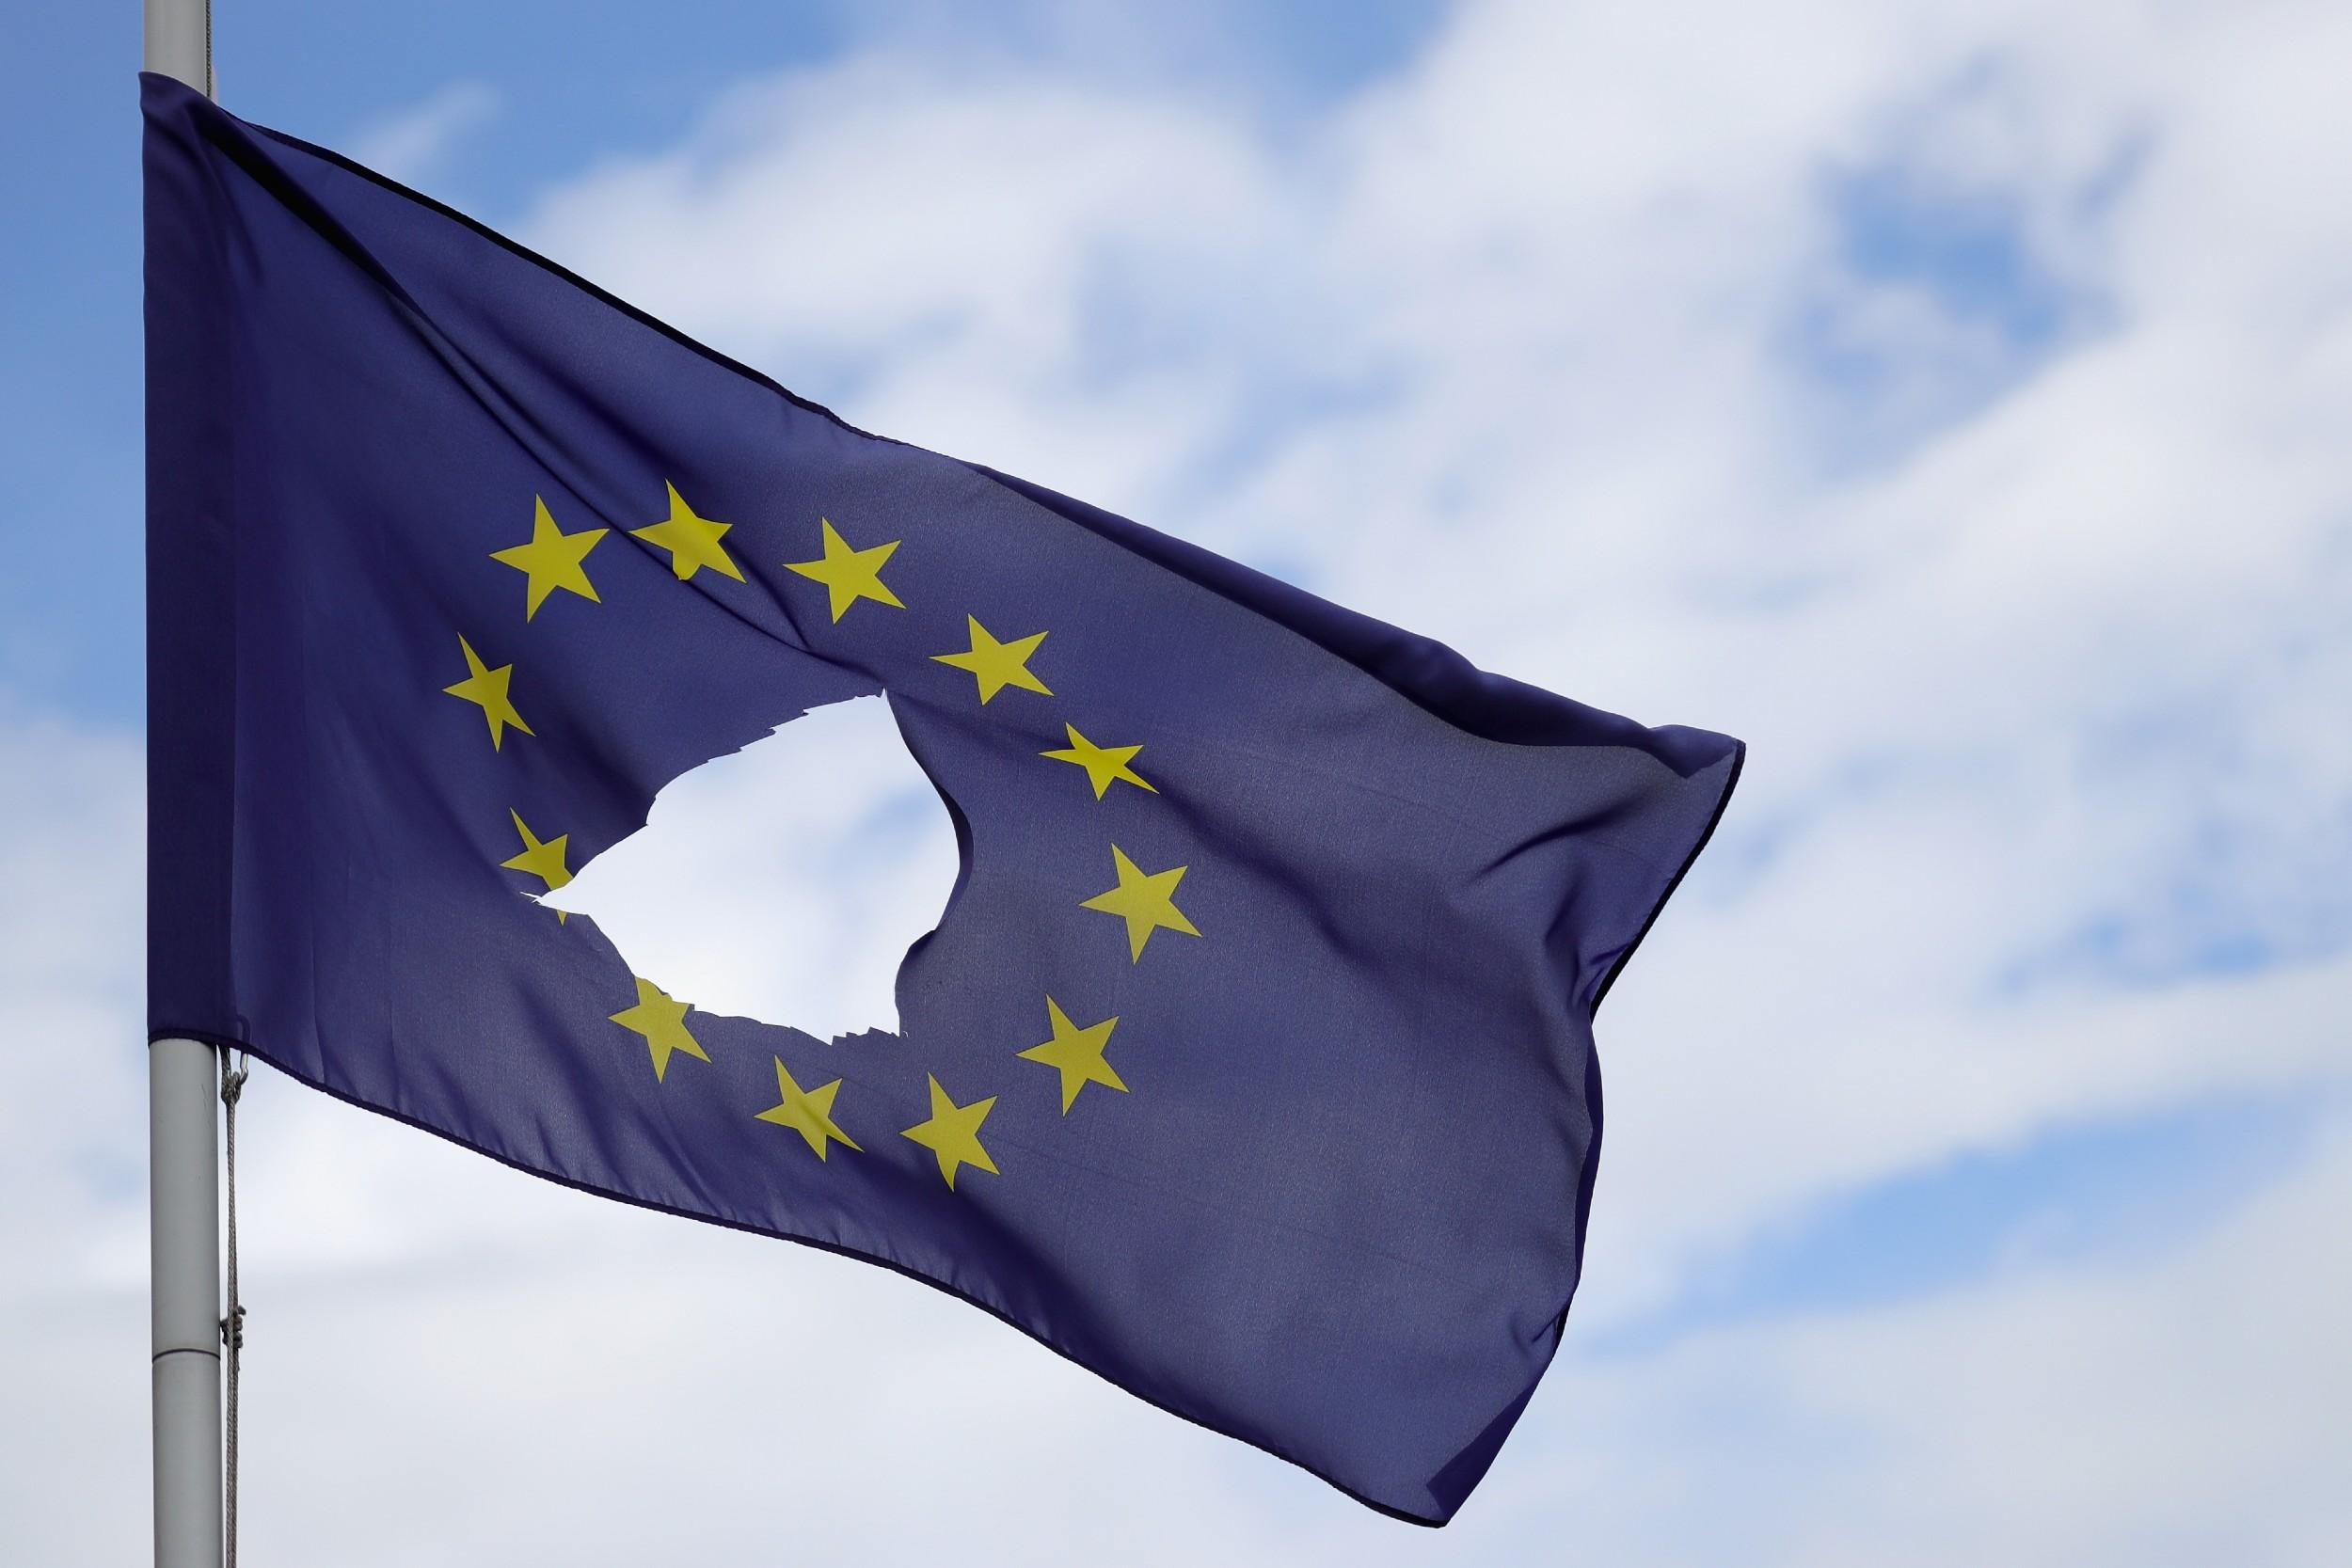 Поцепана застава Европске уније се вијори на ветру. (Фото: Christopher Furlong/Getty Images)